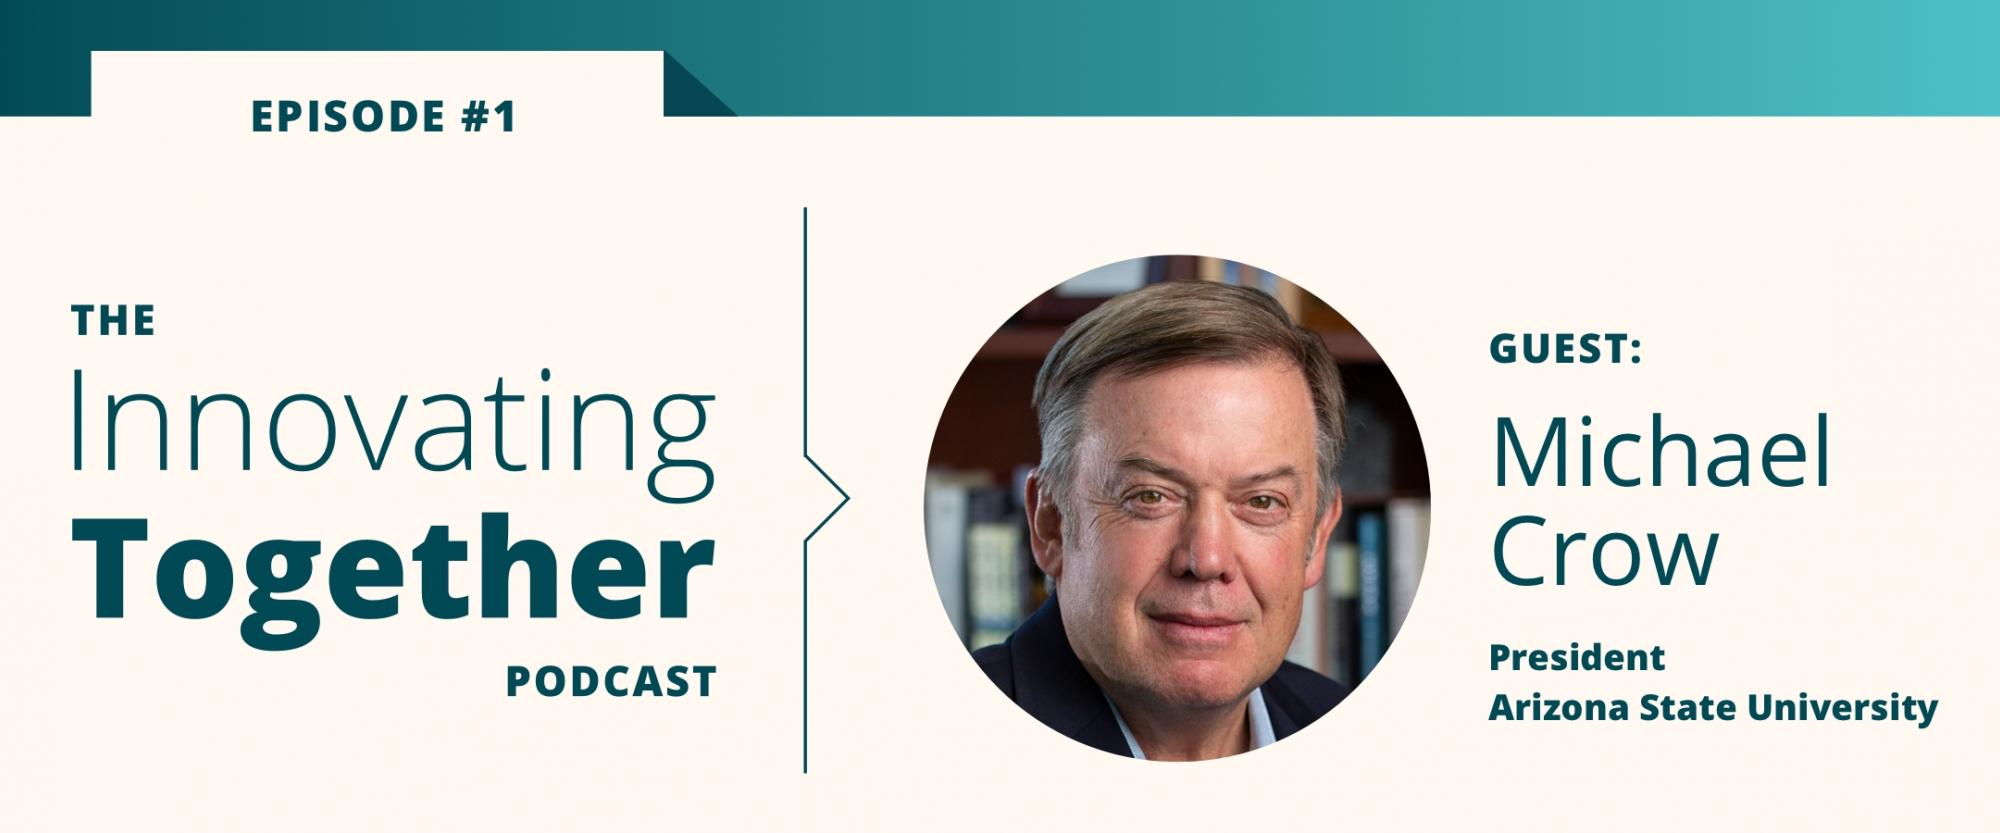 Weekly Wisdom Episode 1: Conversation With Michael Crow, Arizona State University President